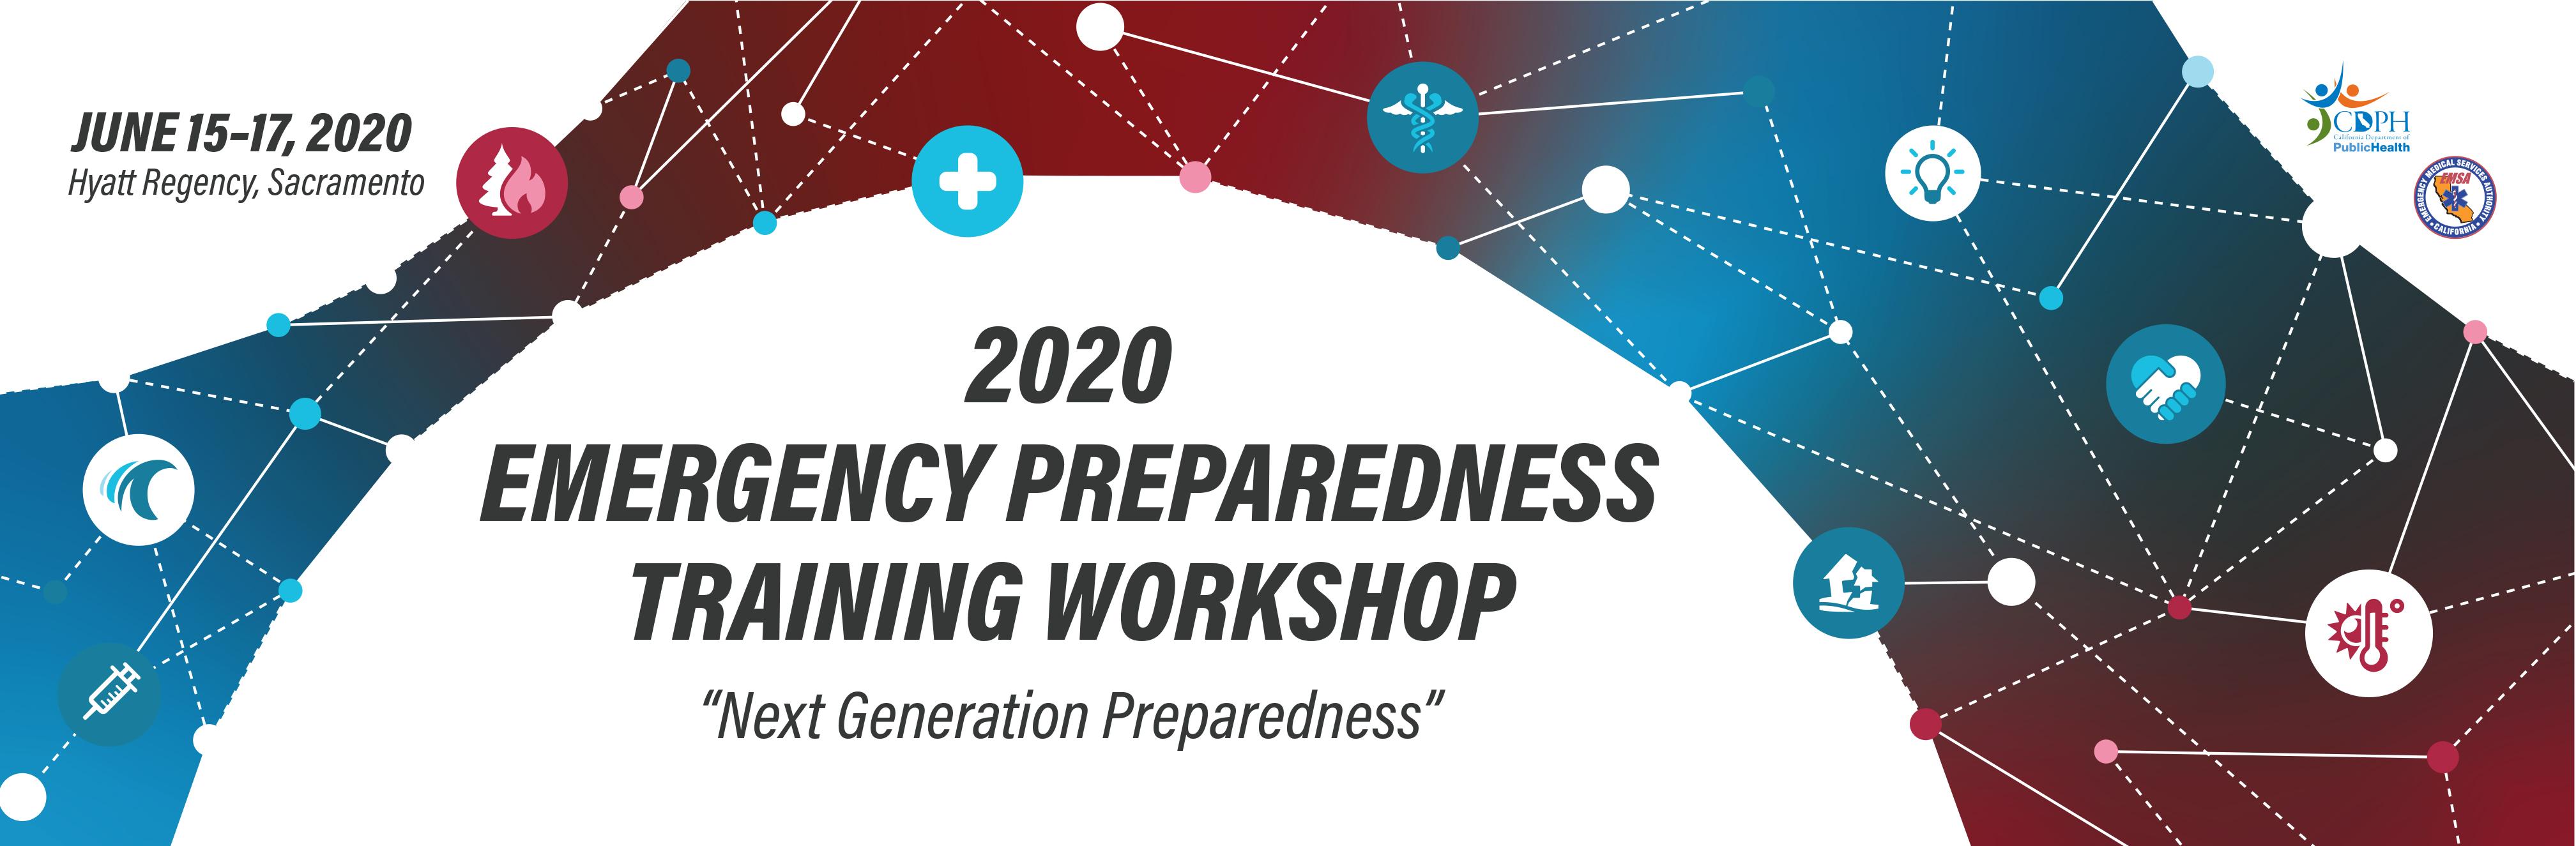 2020 Emergency Preparedness Training Workshop